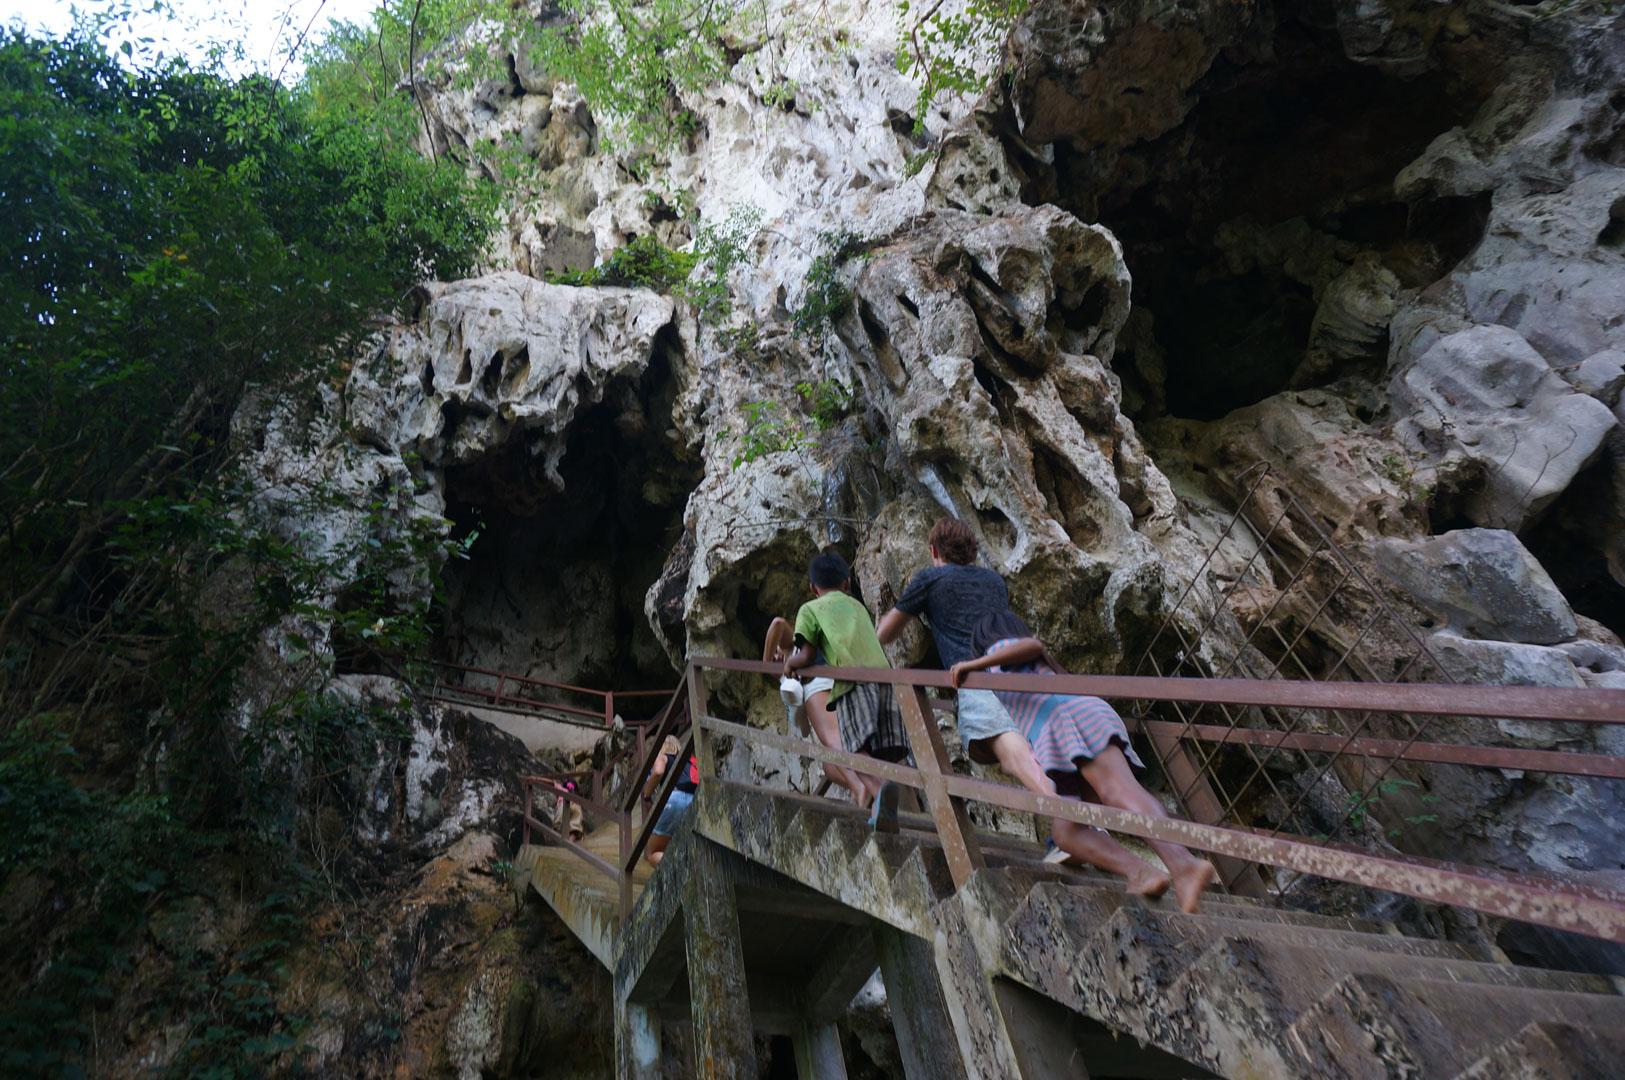 Nuang Khiaw Höle / Cave